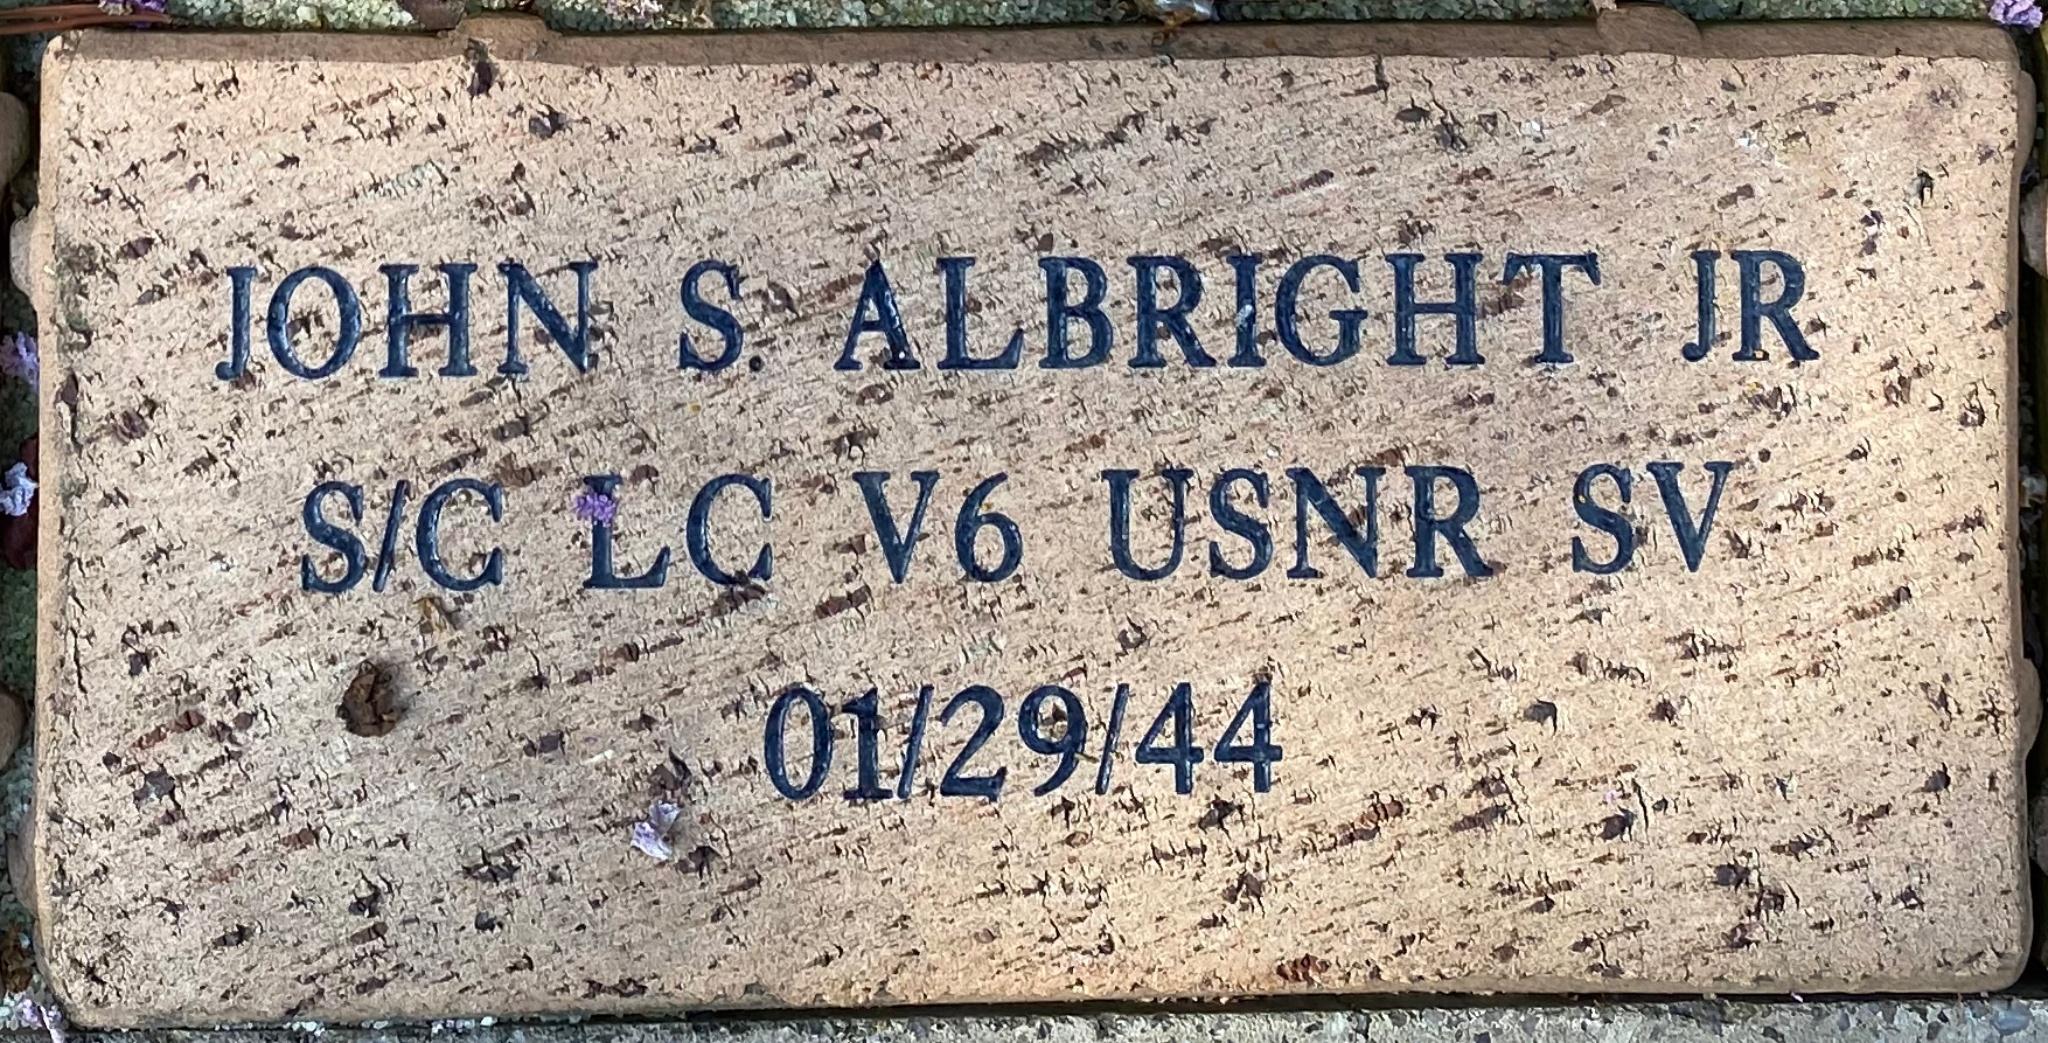 JOHN S. ALBRIGHT JR S/C LC V 6 USNR SV 1/29/1944